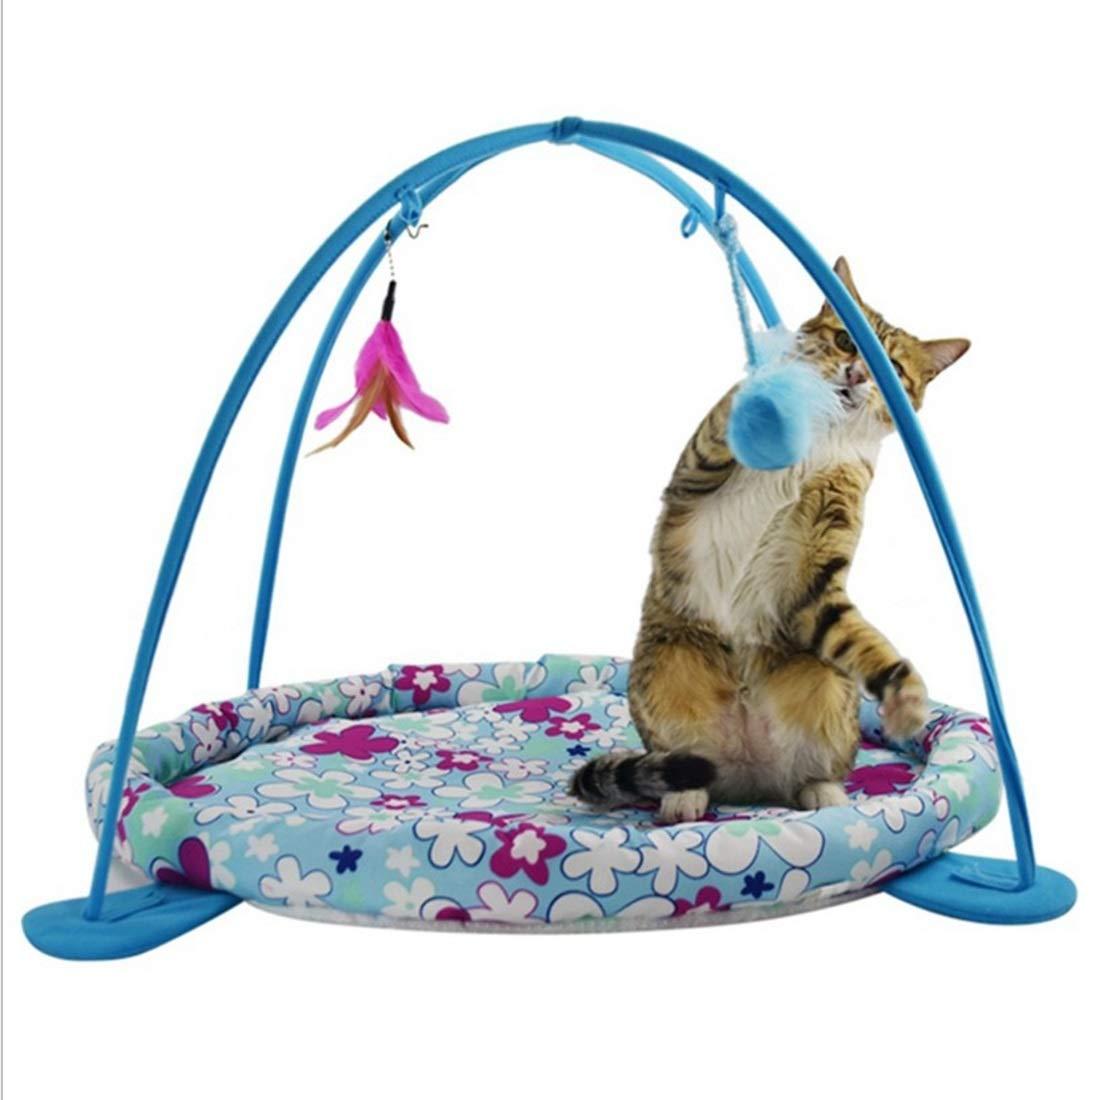 Pearlshop Orange, Blue, Pink Cat Tent Pet Toy Cat Hammock Toy (Color : Blue) by Pearlshop